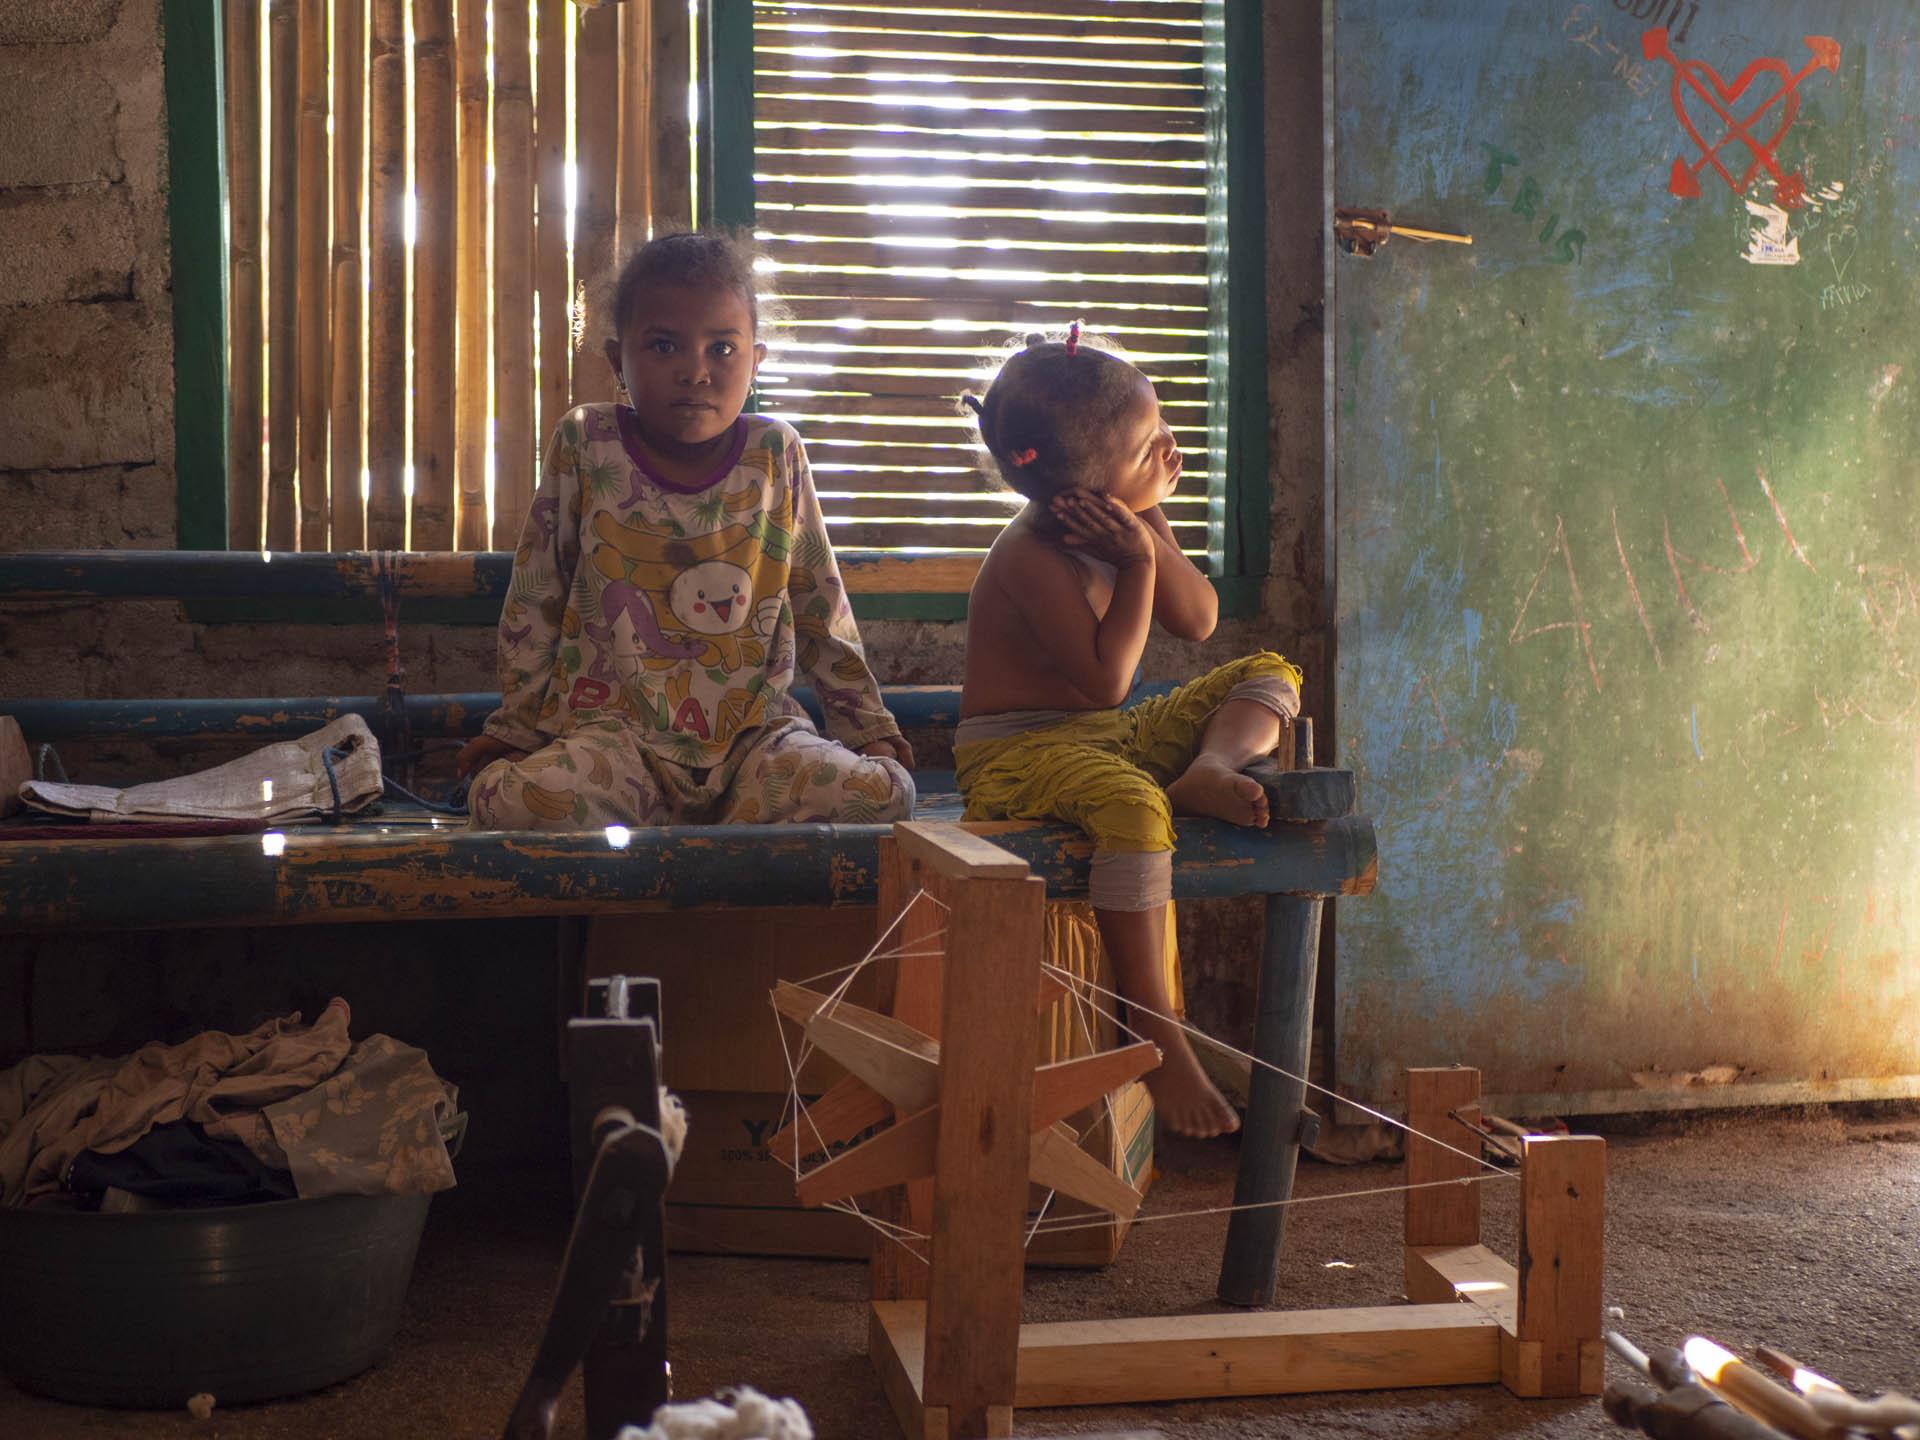 Indonesian children sitting in house